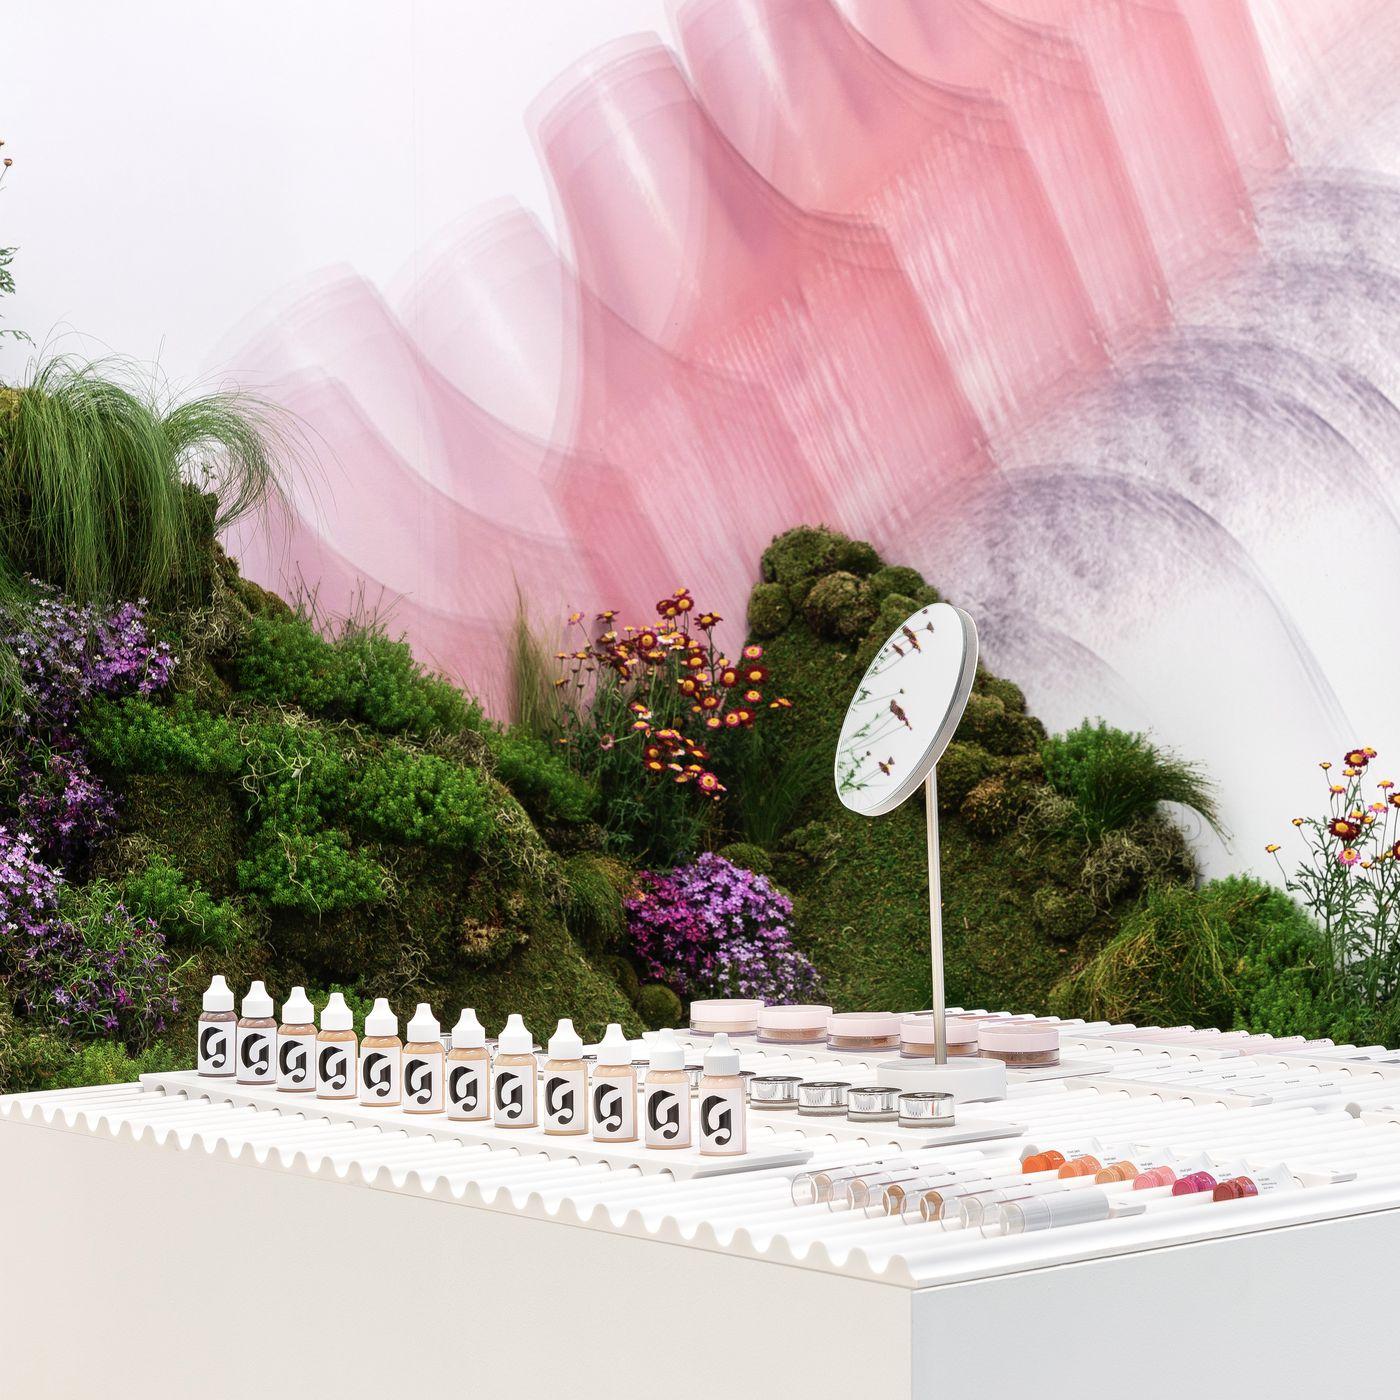 glossier wallpaper phone